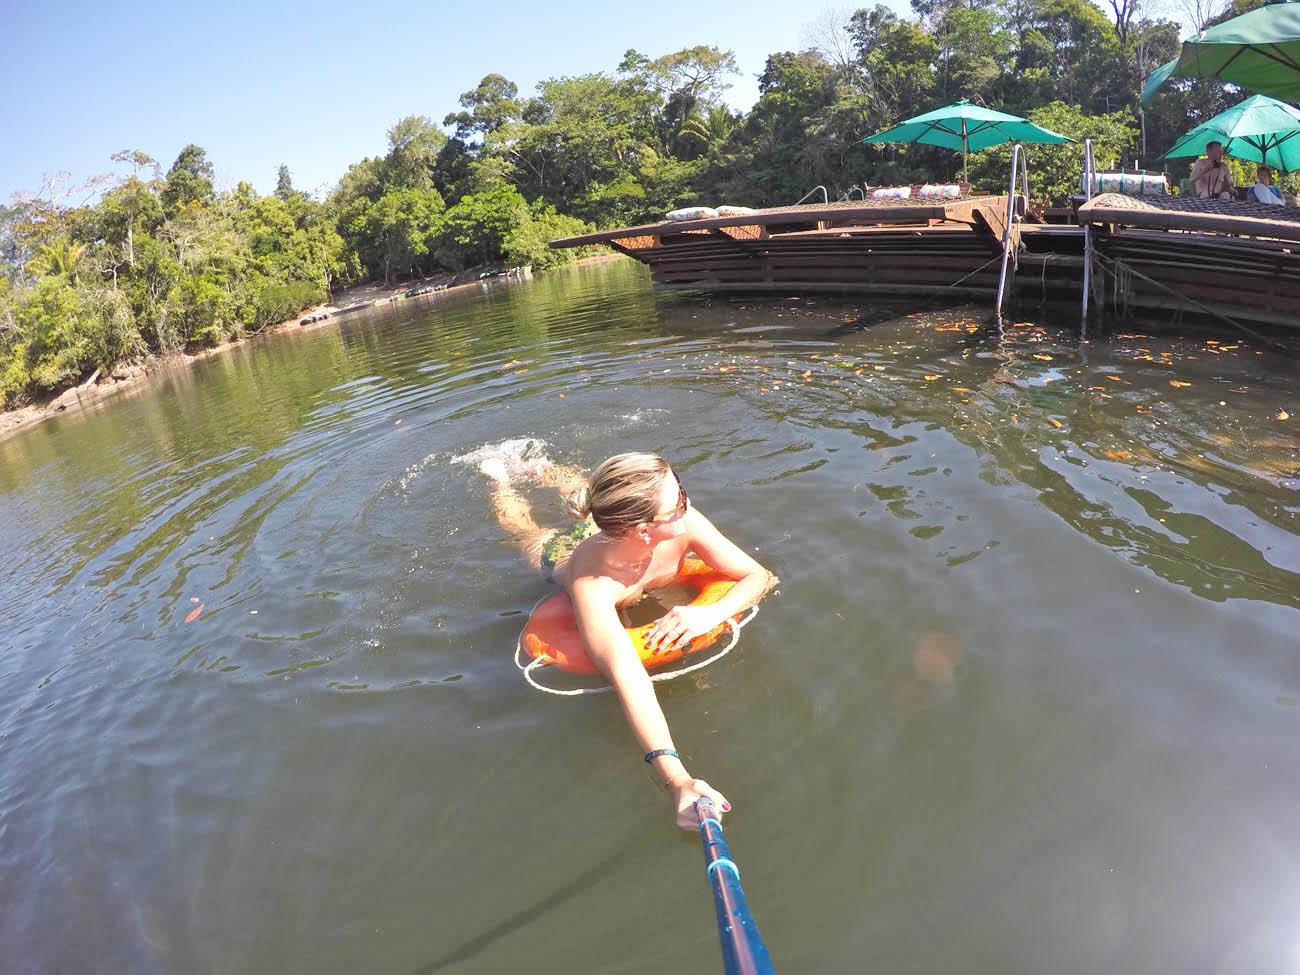 Nadando no Rio Cristalino - Cristalino Lodge